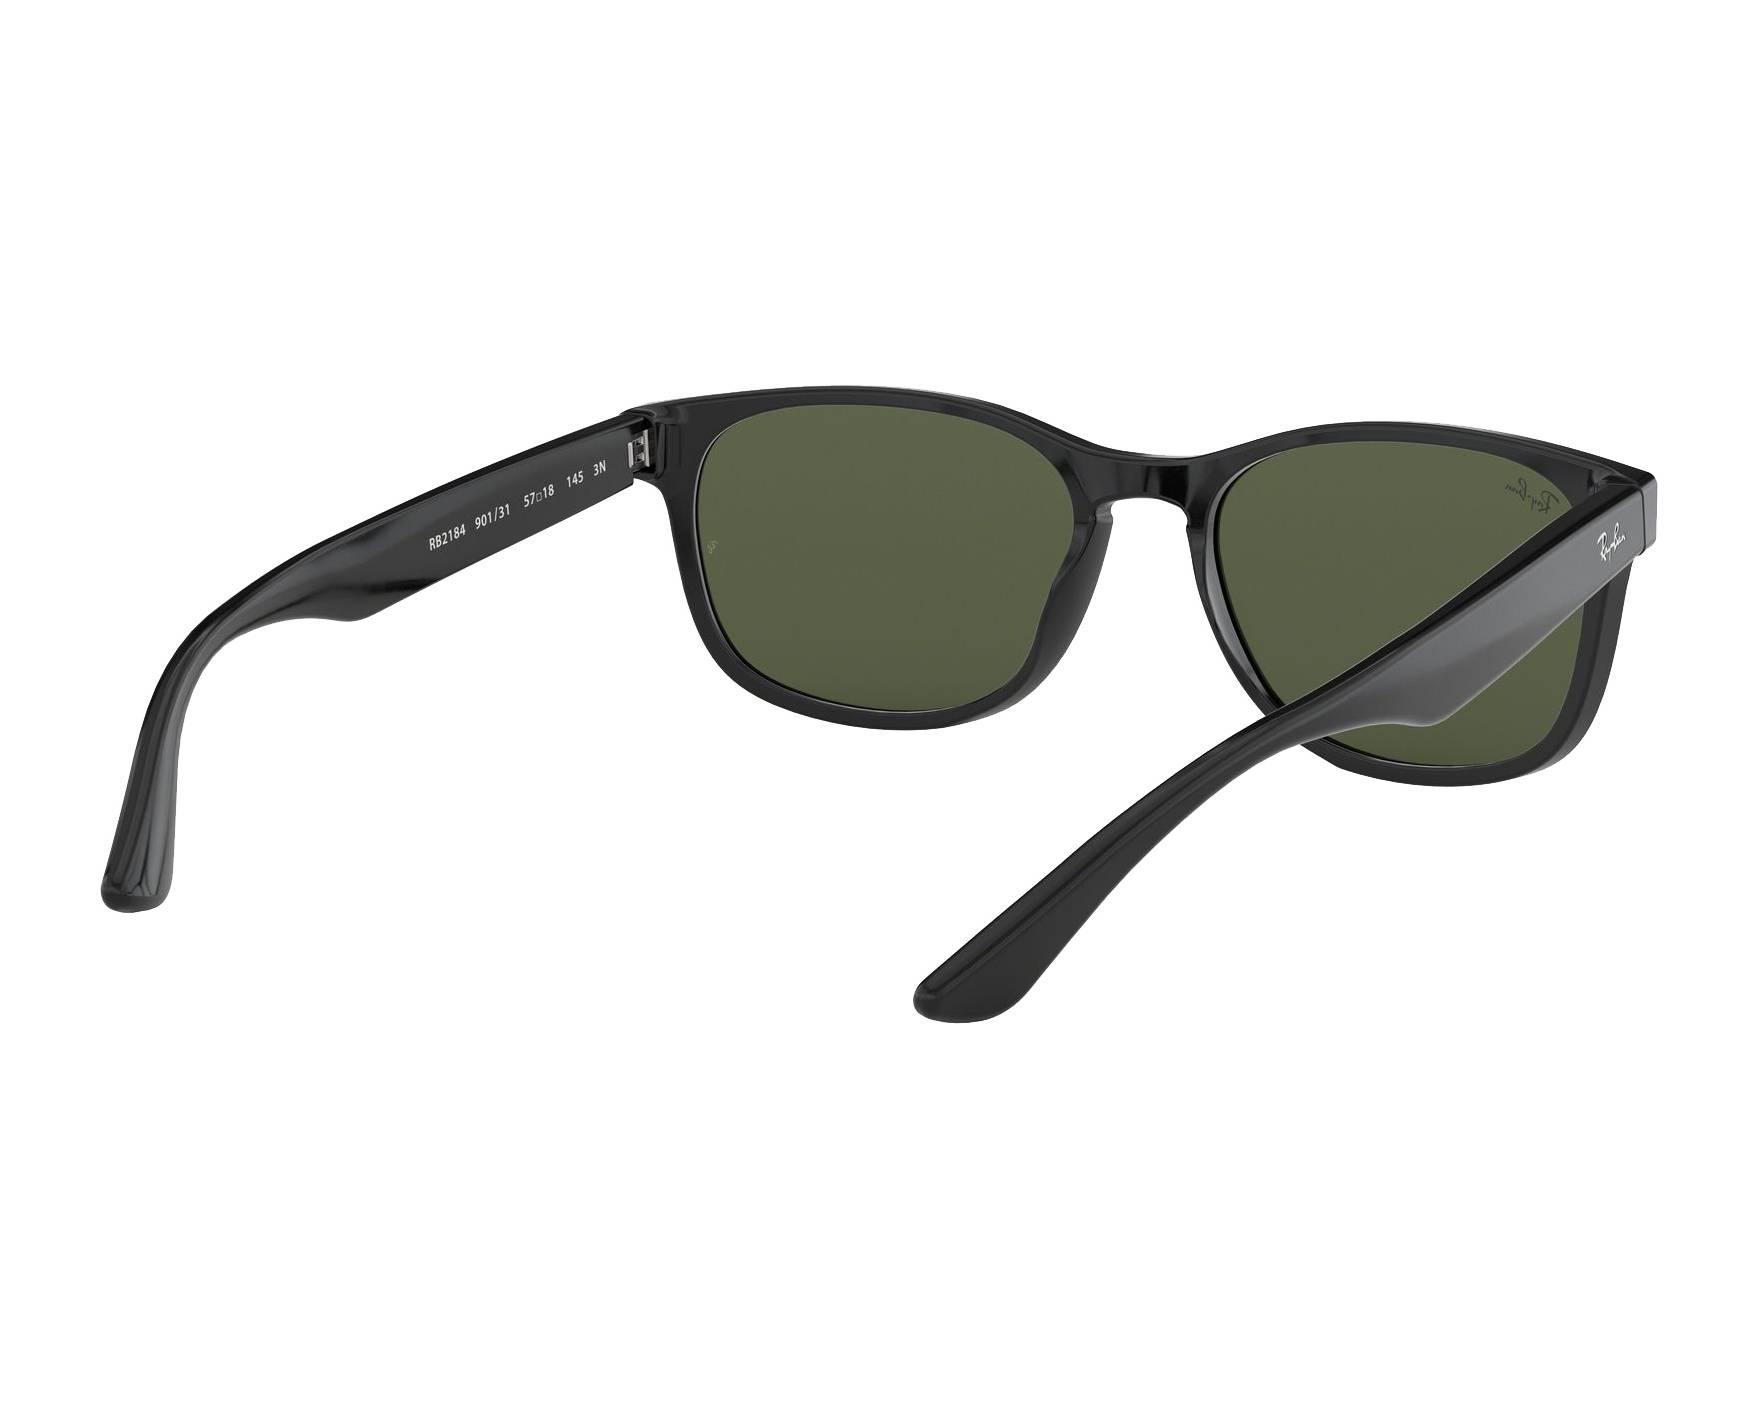 0e43543e80b Sunglasses Ray-Ban RB-2184 901 31 57-18 Black 360 degree